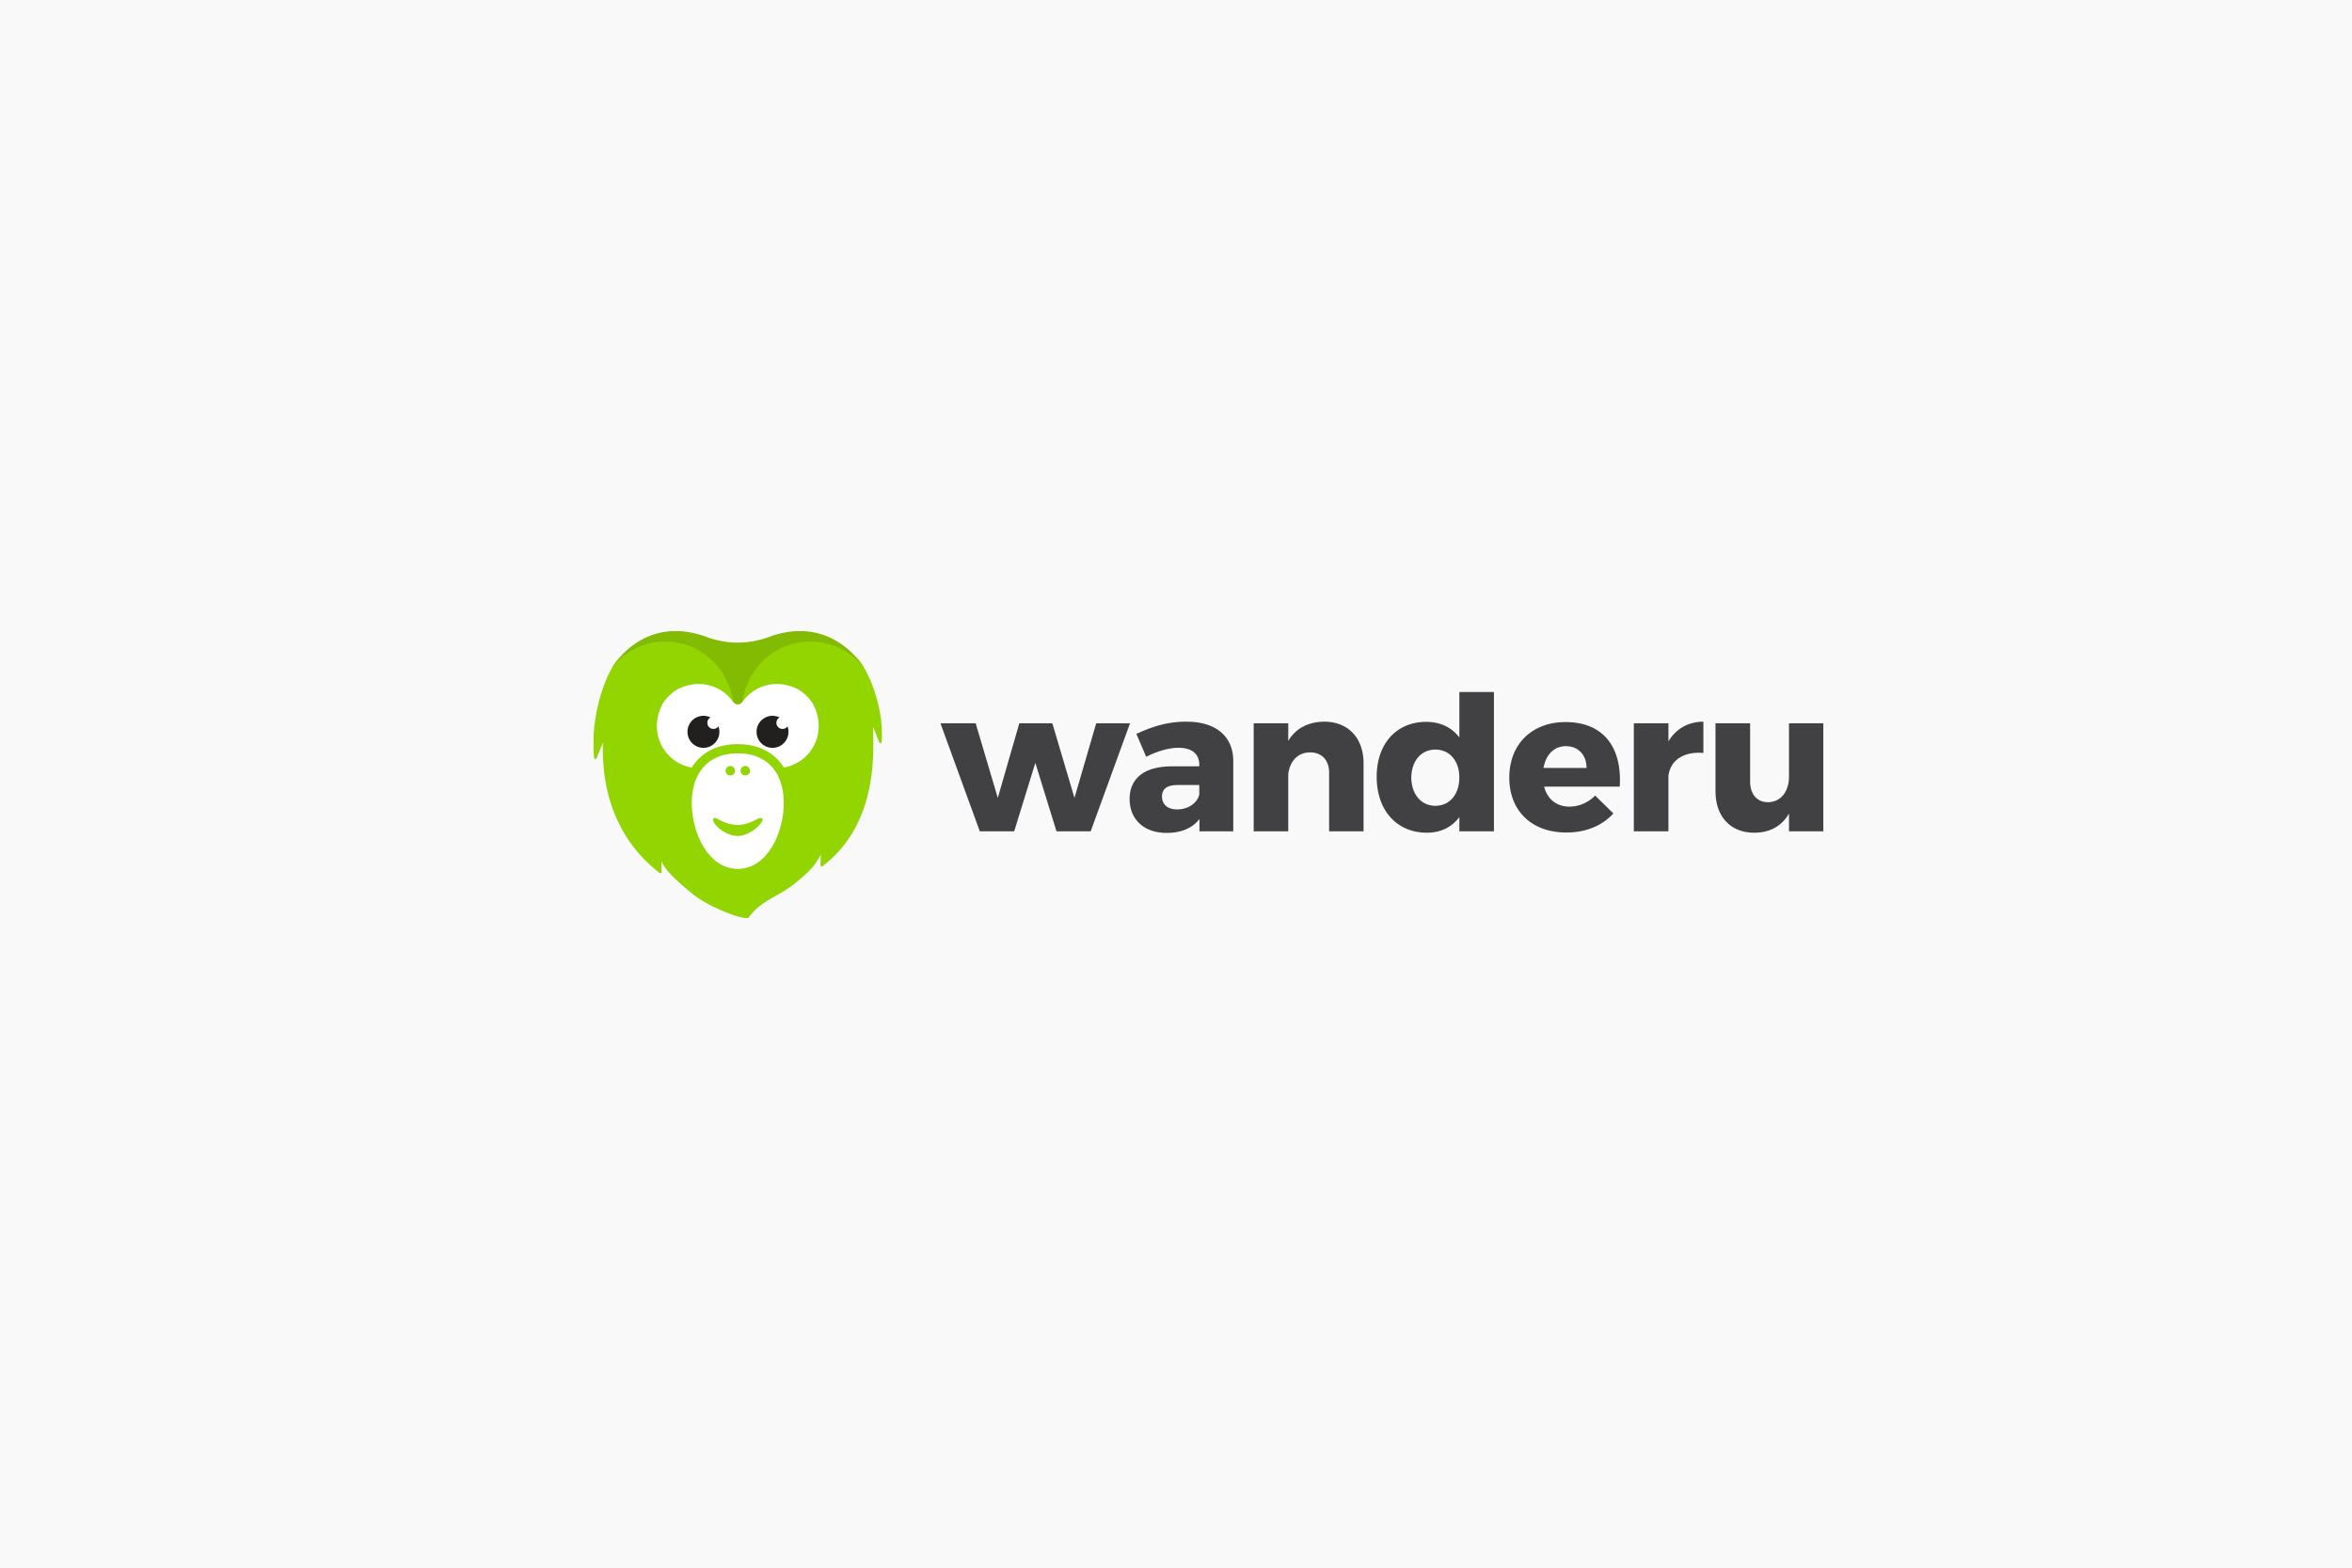 Wanderu logo • horizontal version